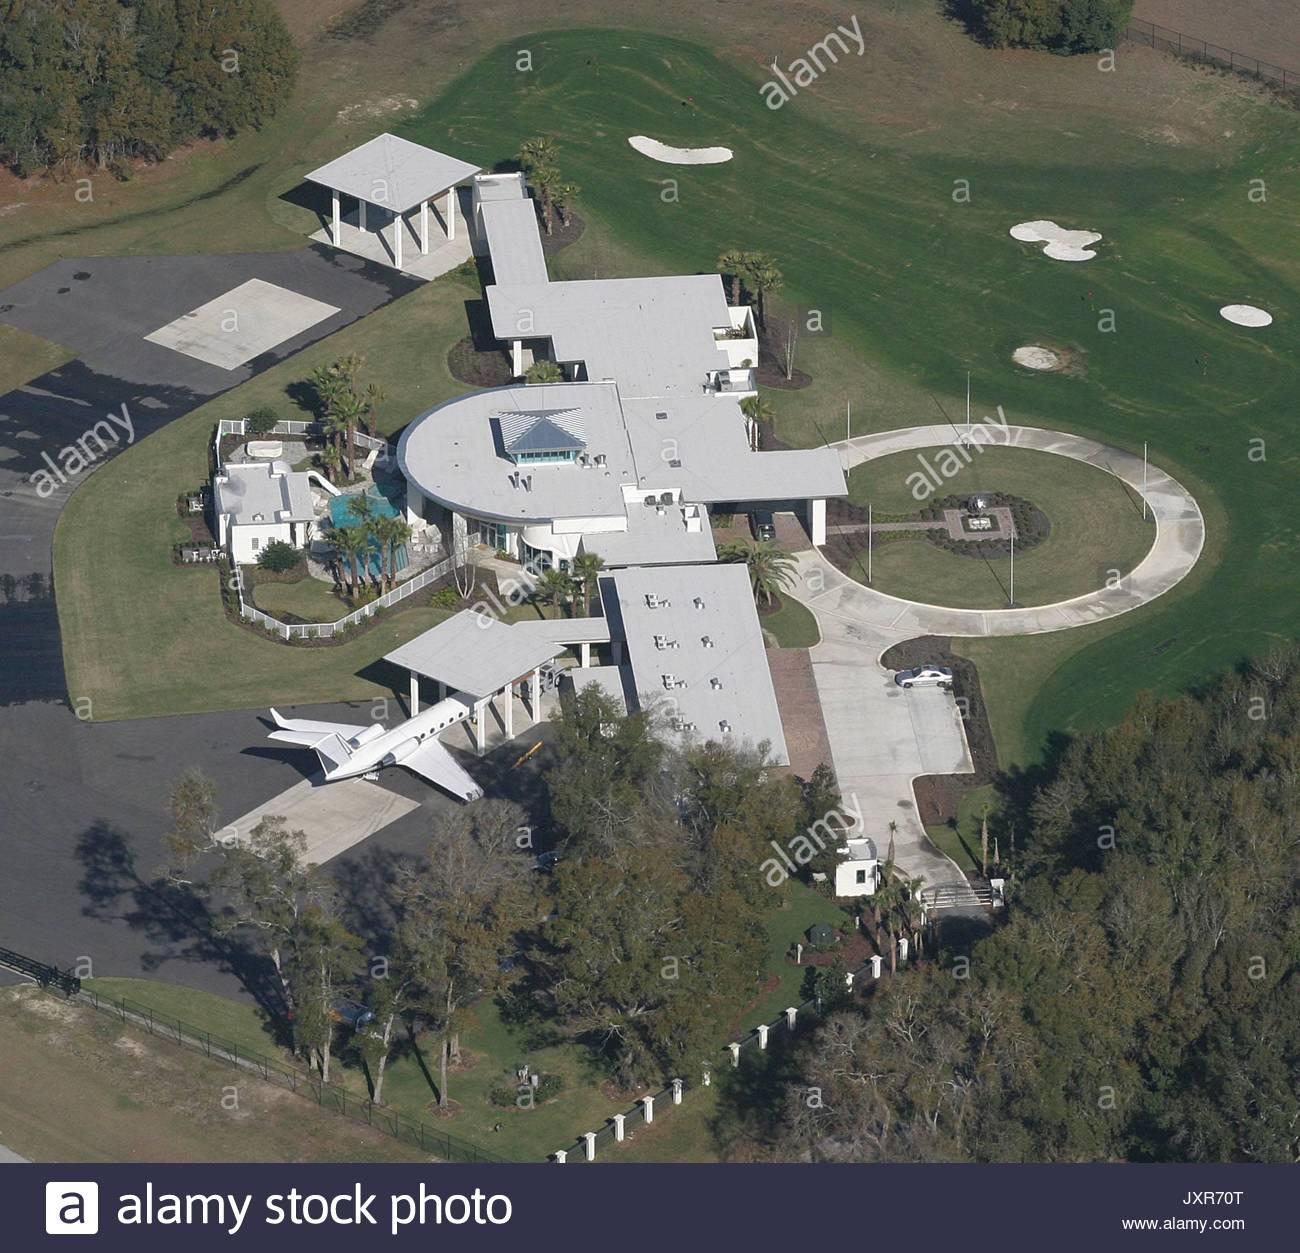 John Travoltau0027s Home. John Travoltau0027s Home In Florida Called U0027 Jumbolairu0027  In Ocala .